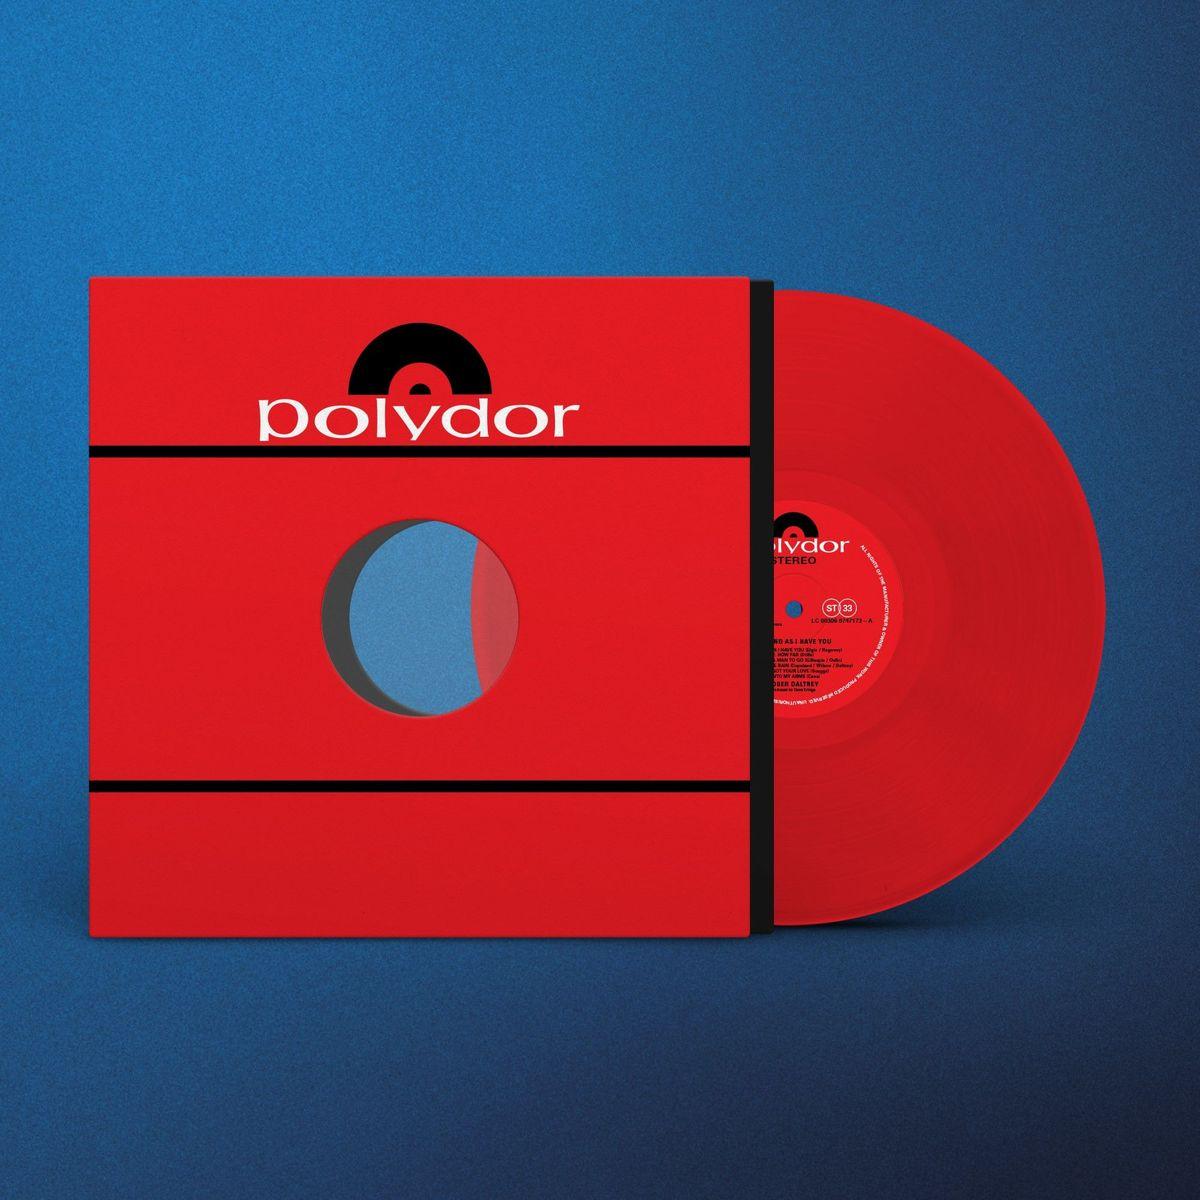 лучшая цена Роджер Долтри Roger Daltrey. As Long As I Have You (Coloured Red) (LP)